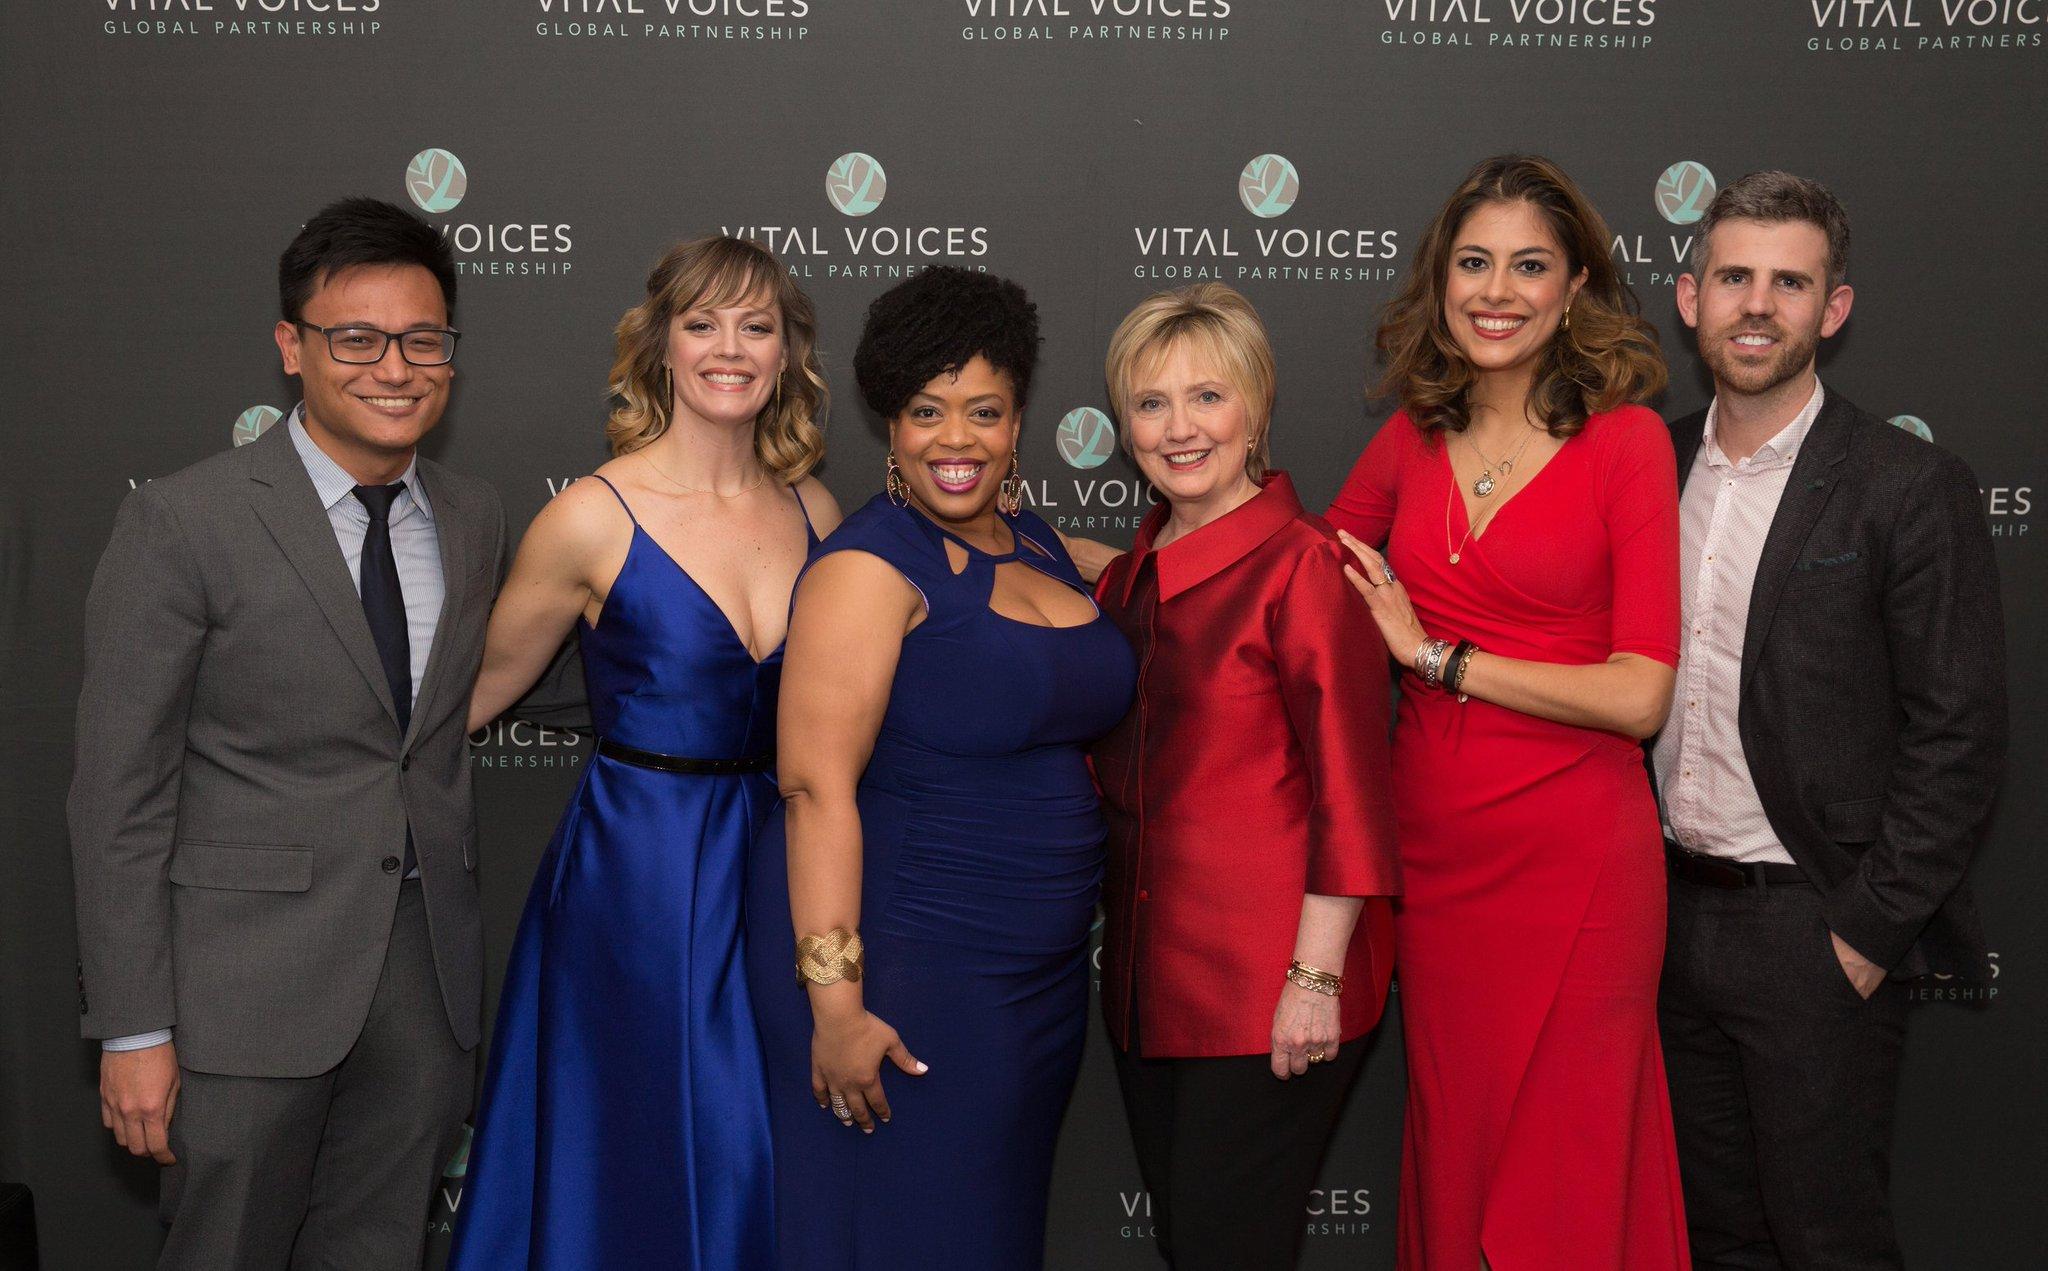 Vital Voices Global Leadership Awards